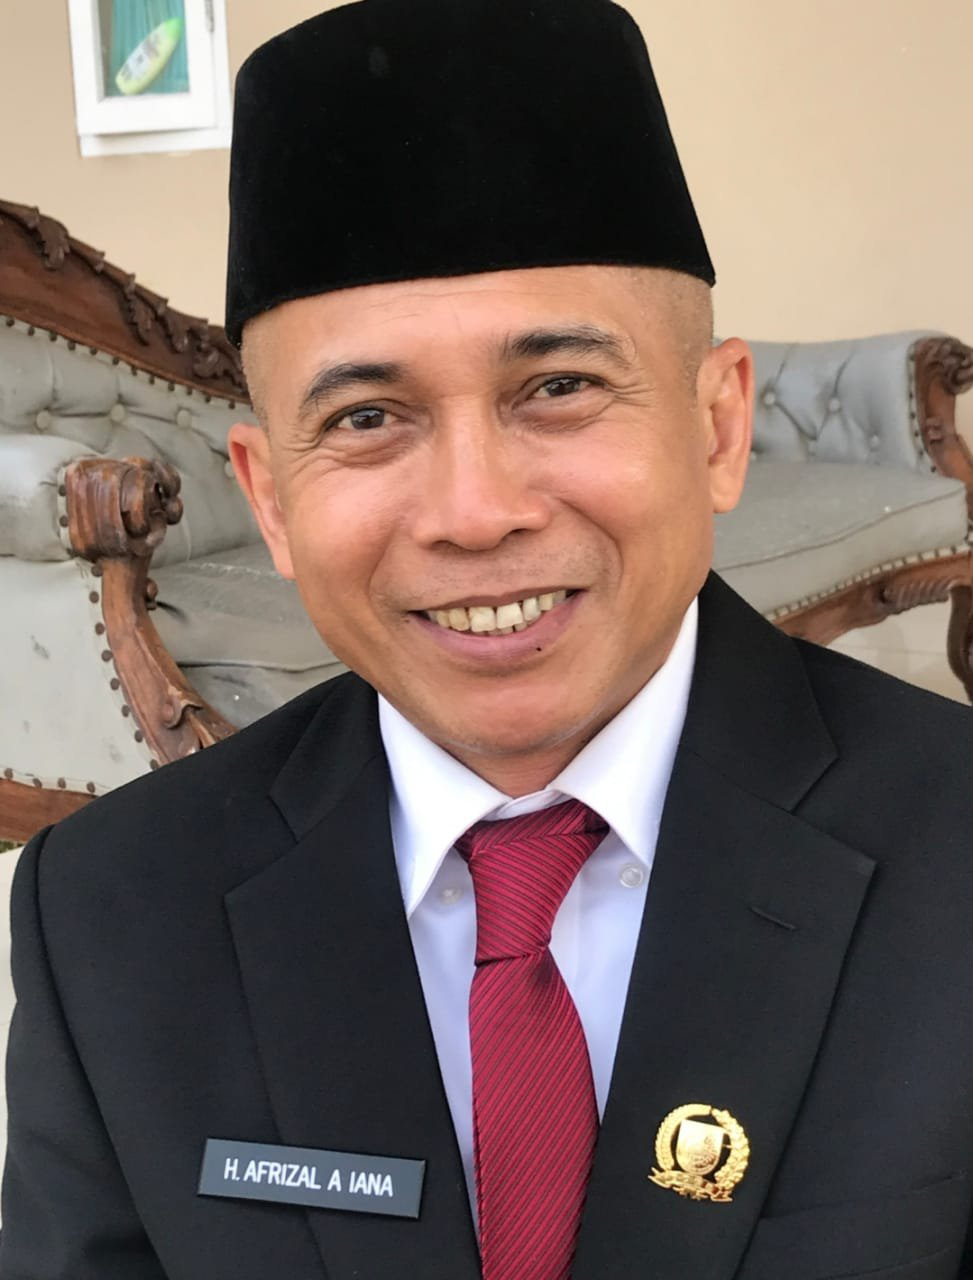 Photo of Afrizal Lana Anggota DPRD Kota Depok, Mencari Keadilan